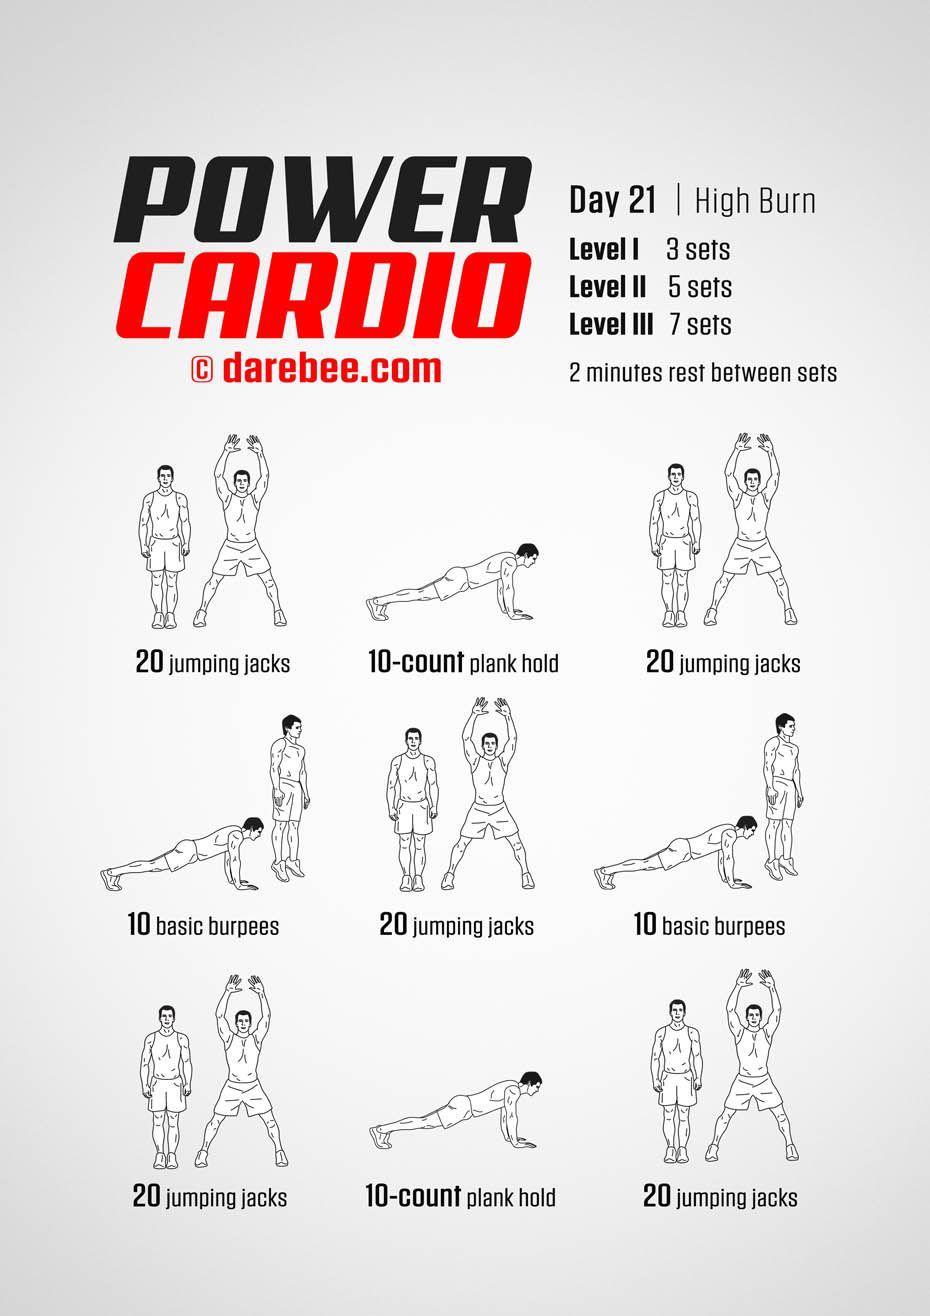 Power Cardio Workout Beginner Cardio Workout Aerobics Workout Cardio Workout At Home